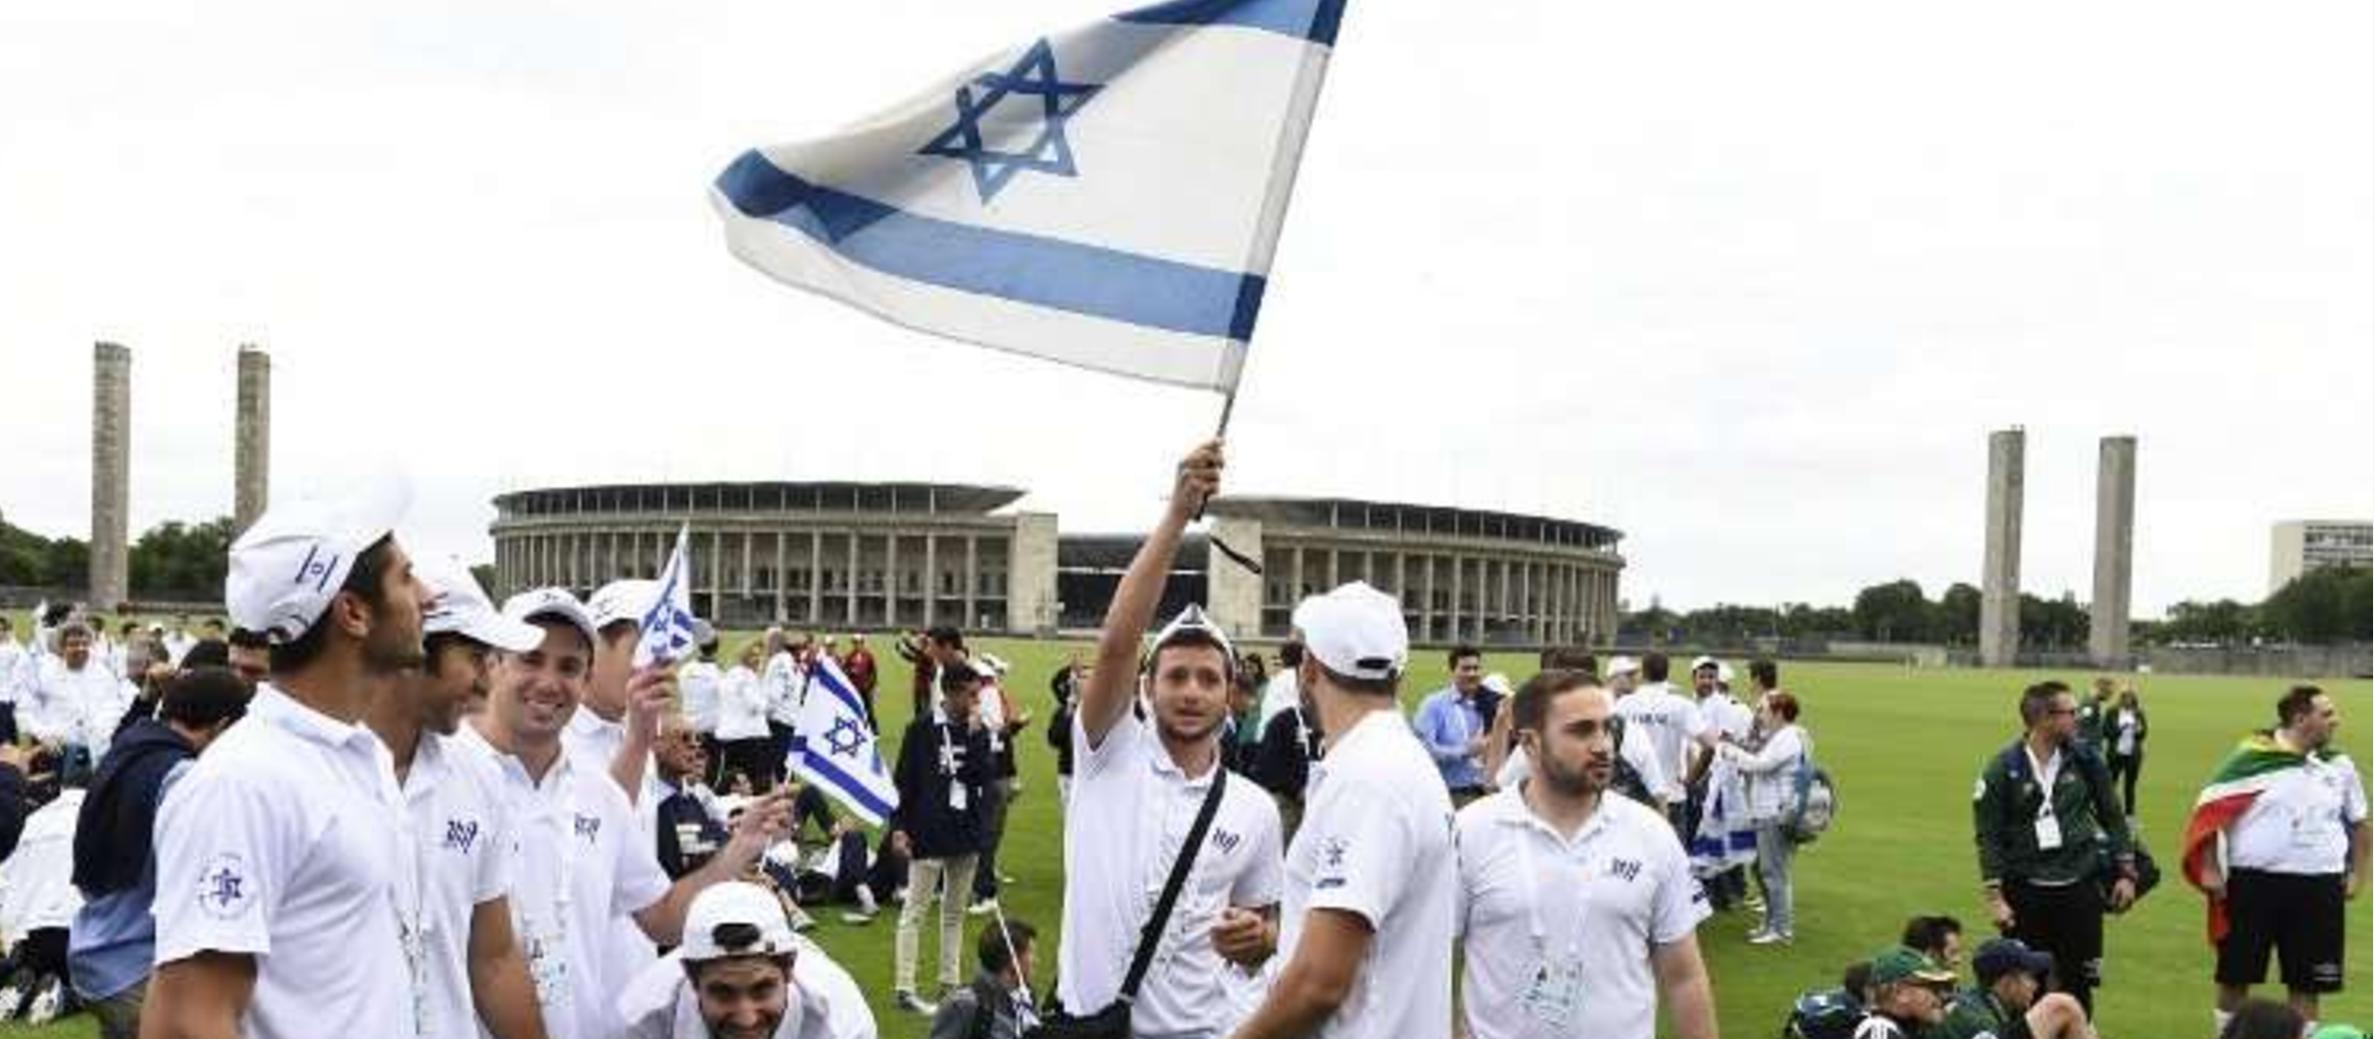 Germany: Spate of anti-Semitism in Berlin during Jewish 'Maccabi Games'